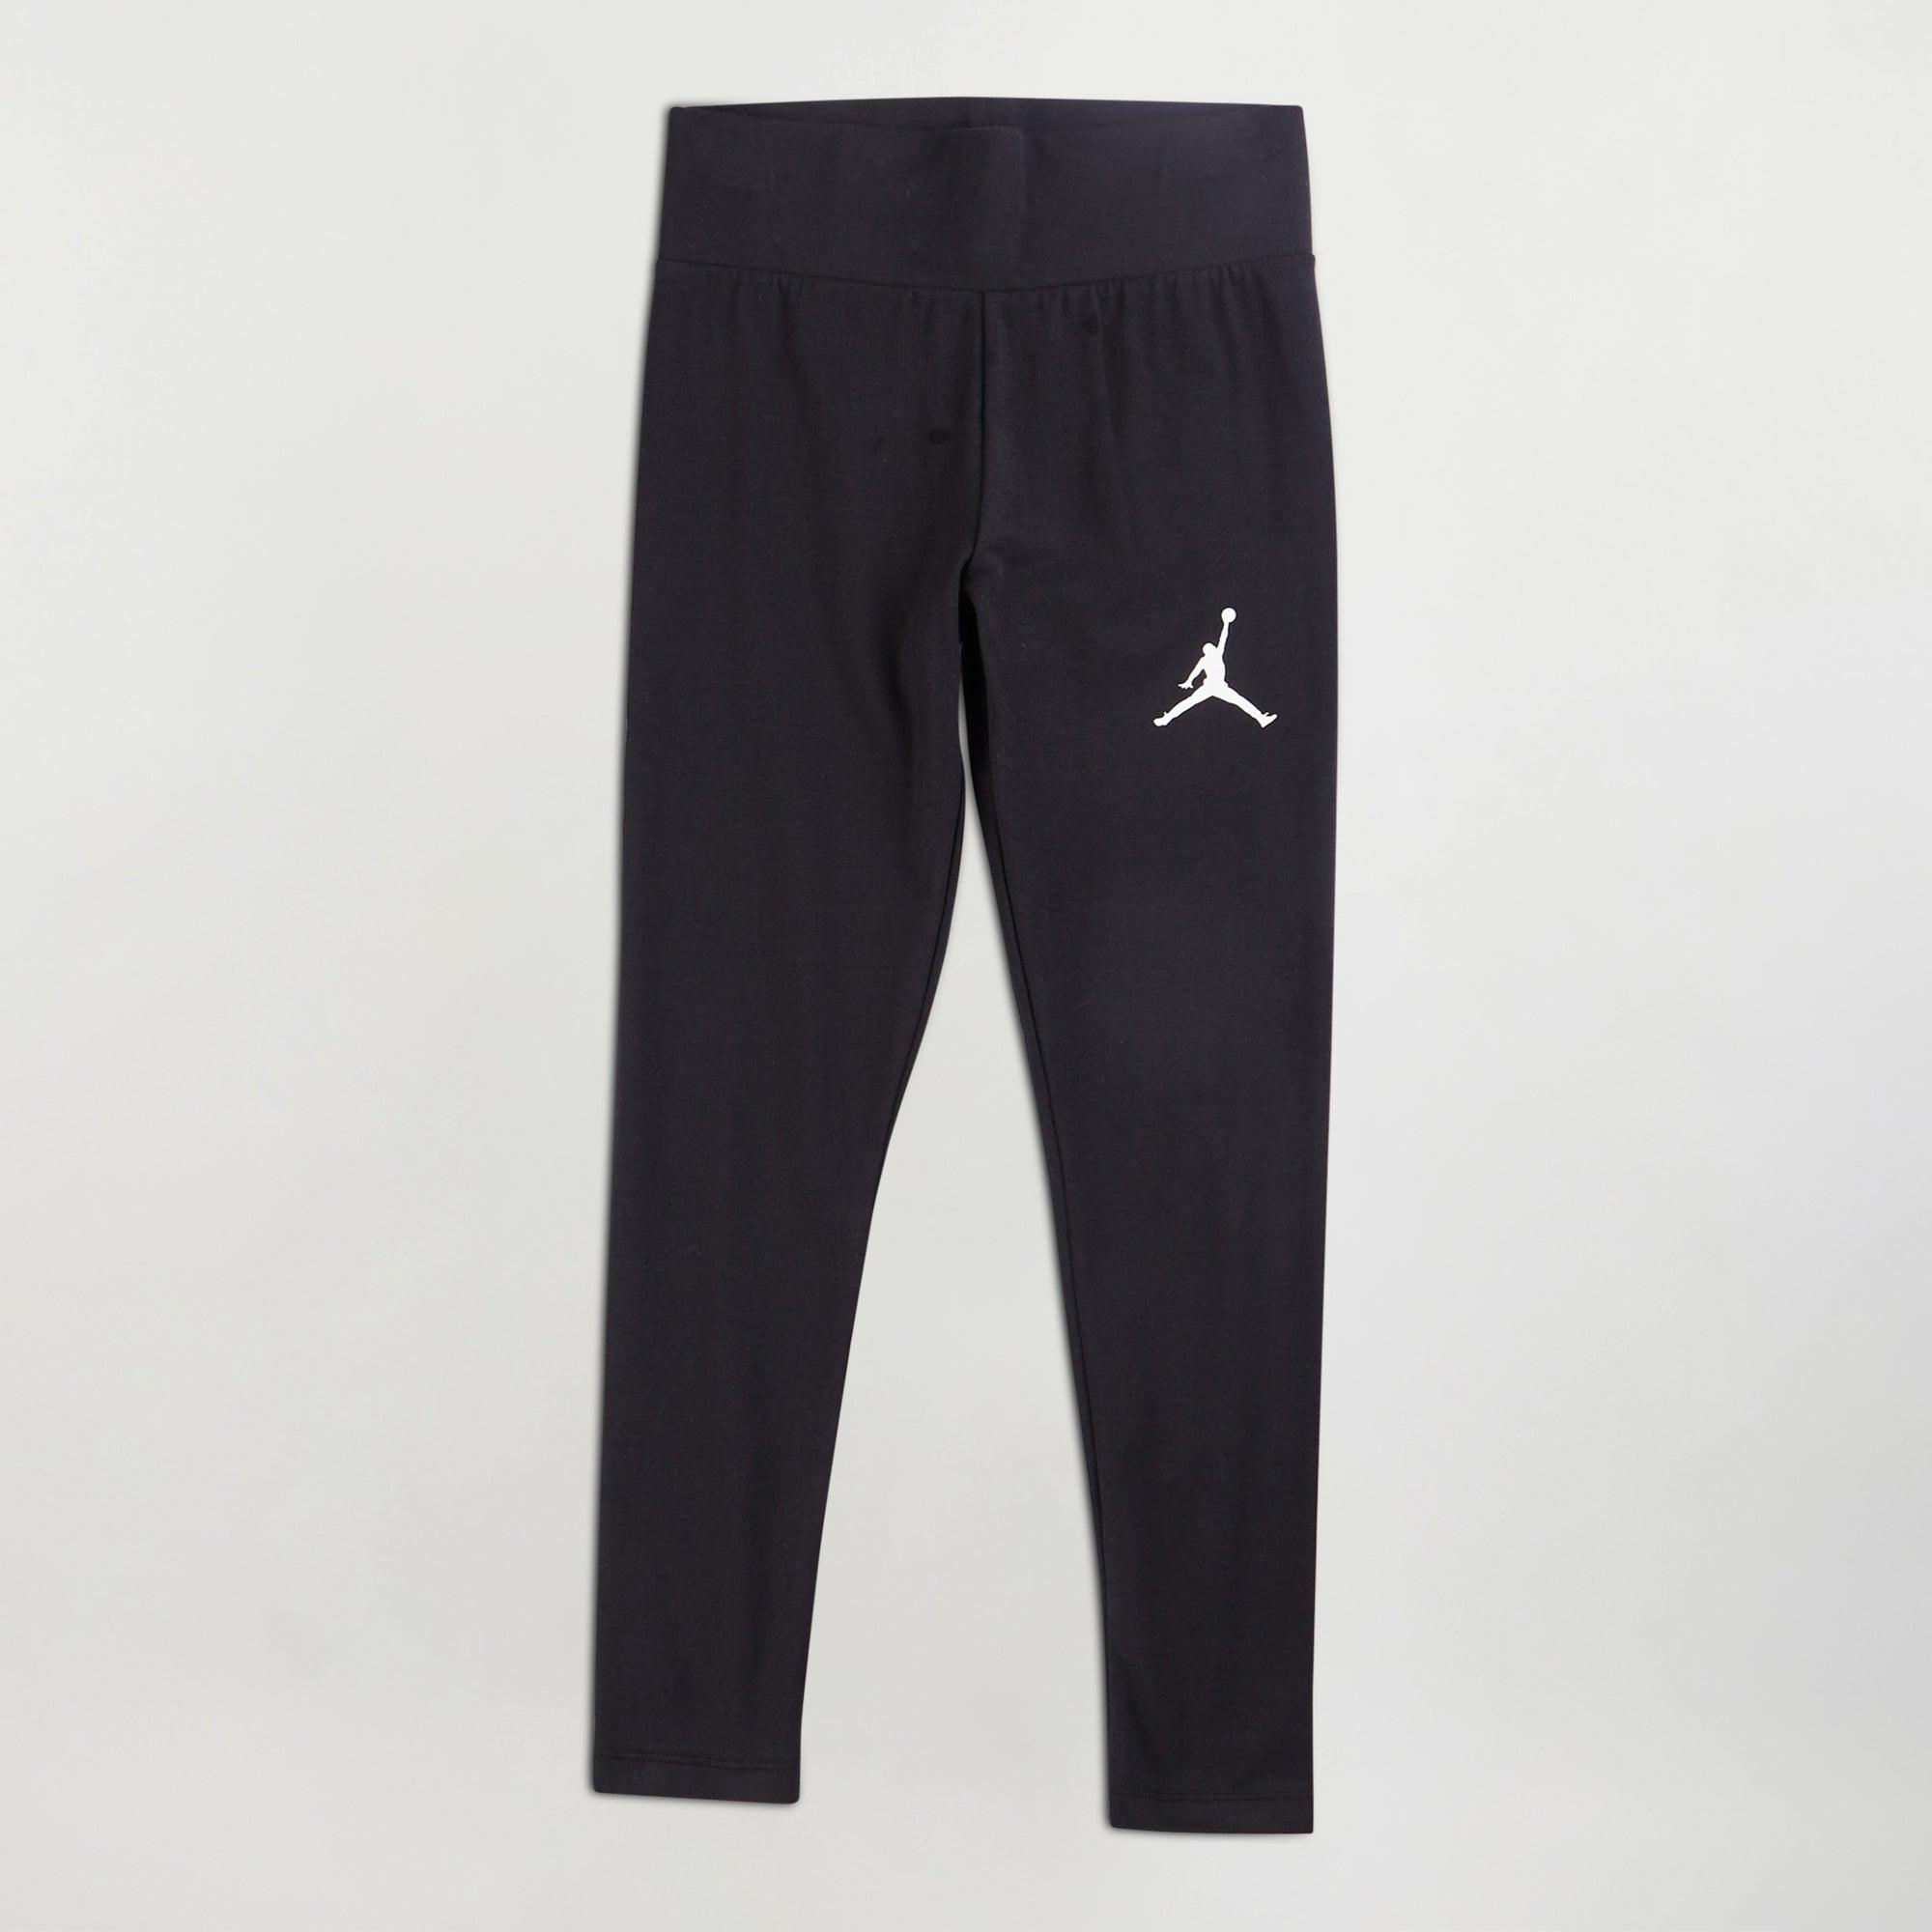 Jordan Jumpman basisschool broek